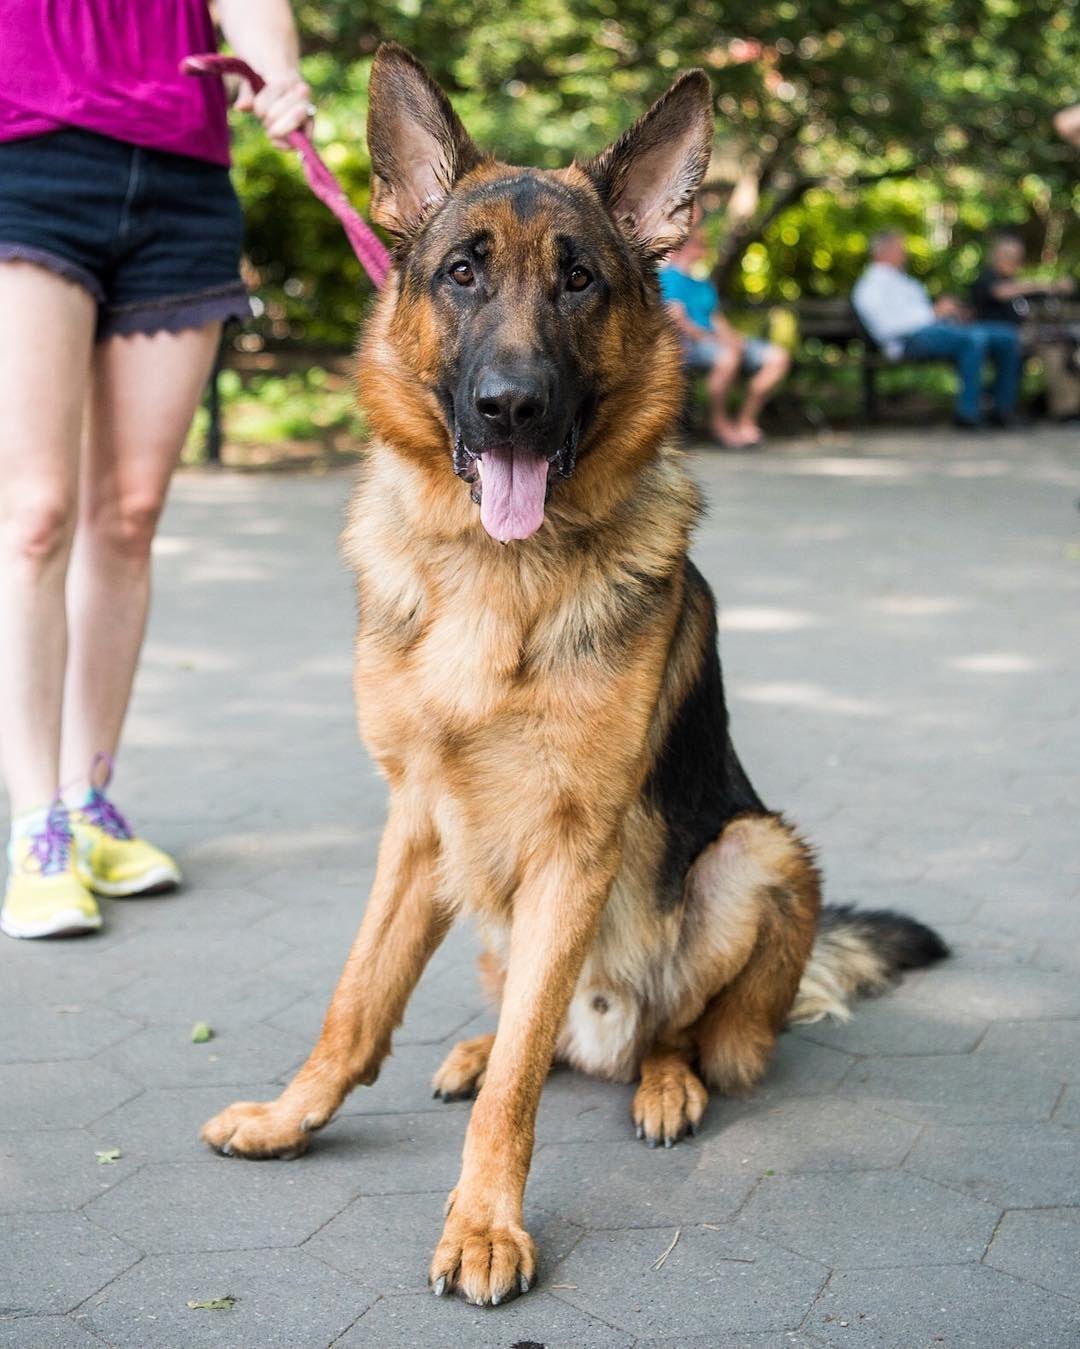 Bruno German Shepherd (1 y/o) Washington Square Park New